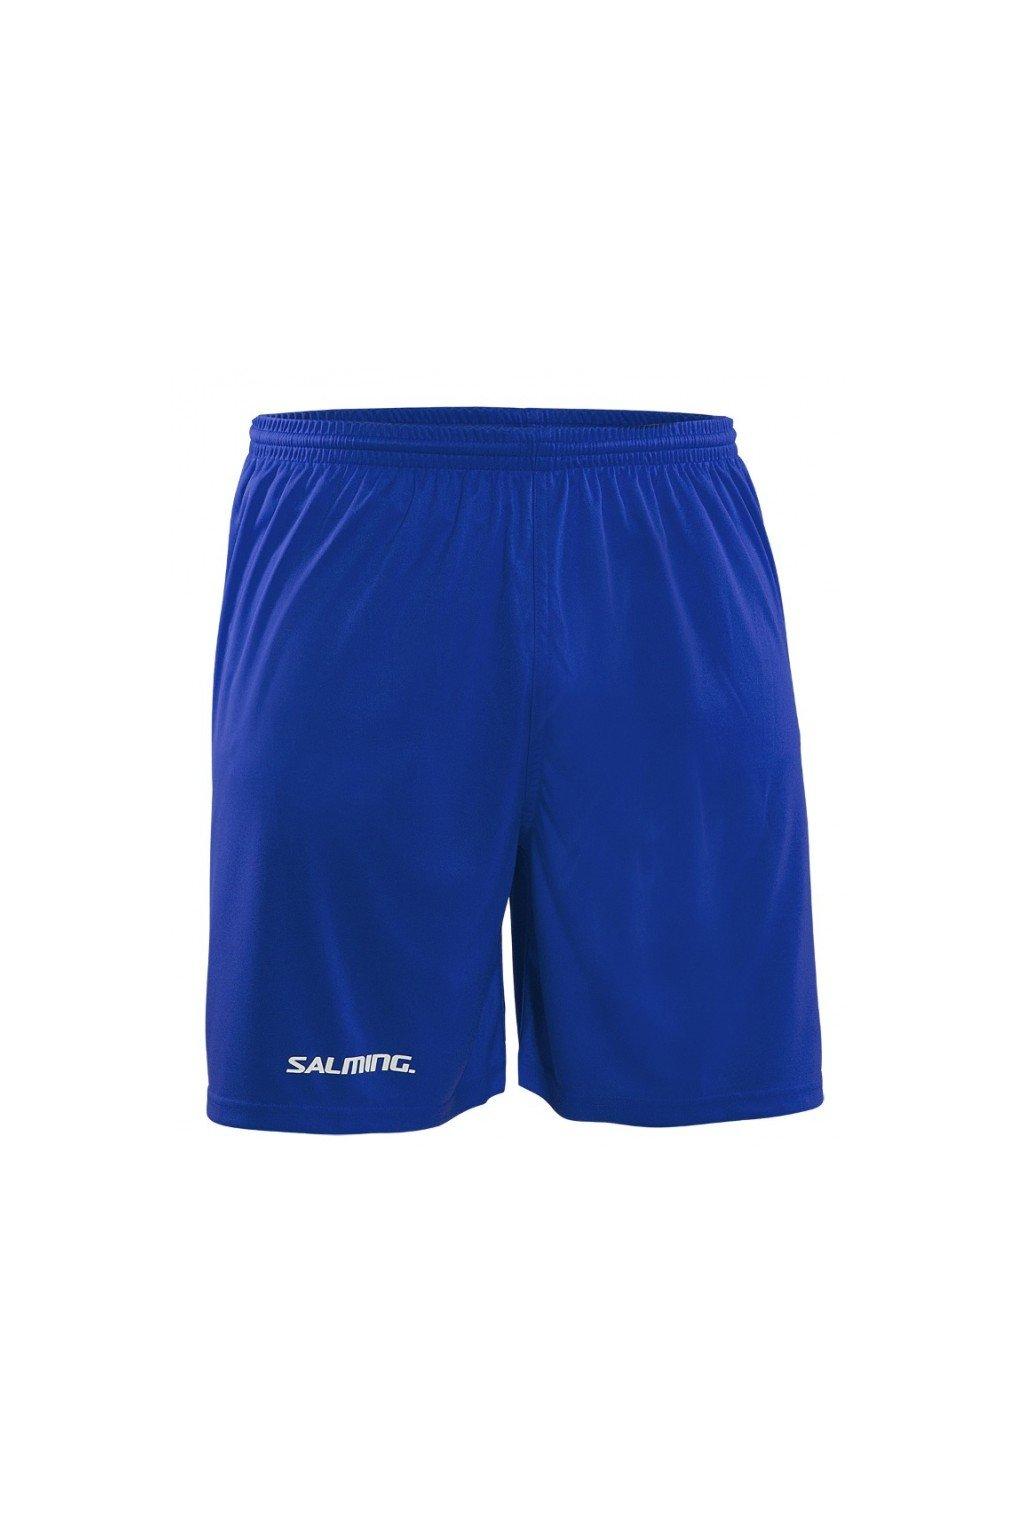 SALMING Core Shorts JR Royal Blue